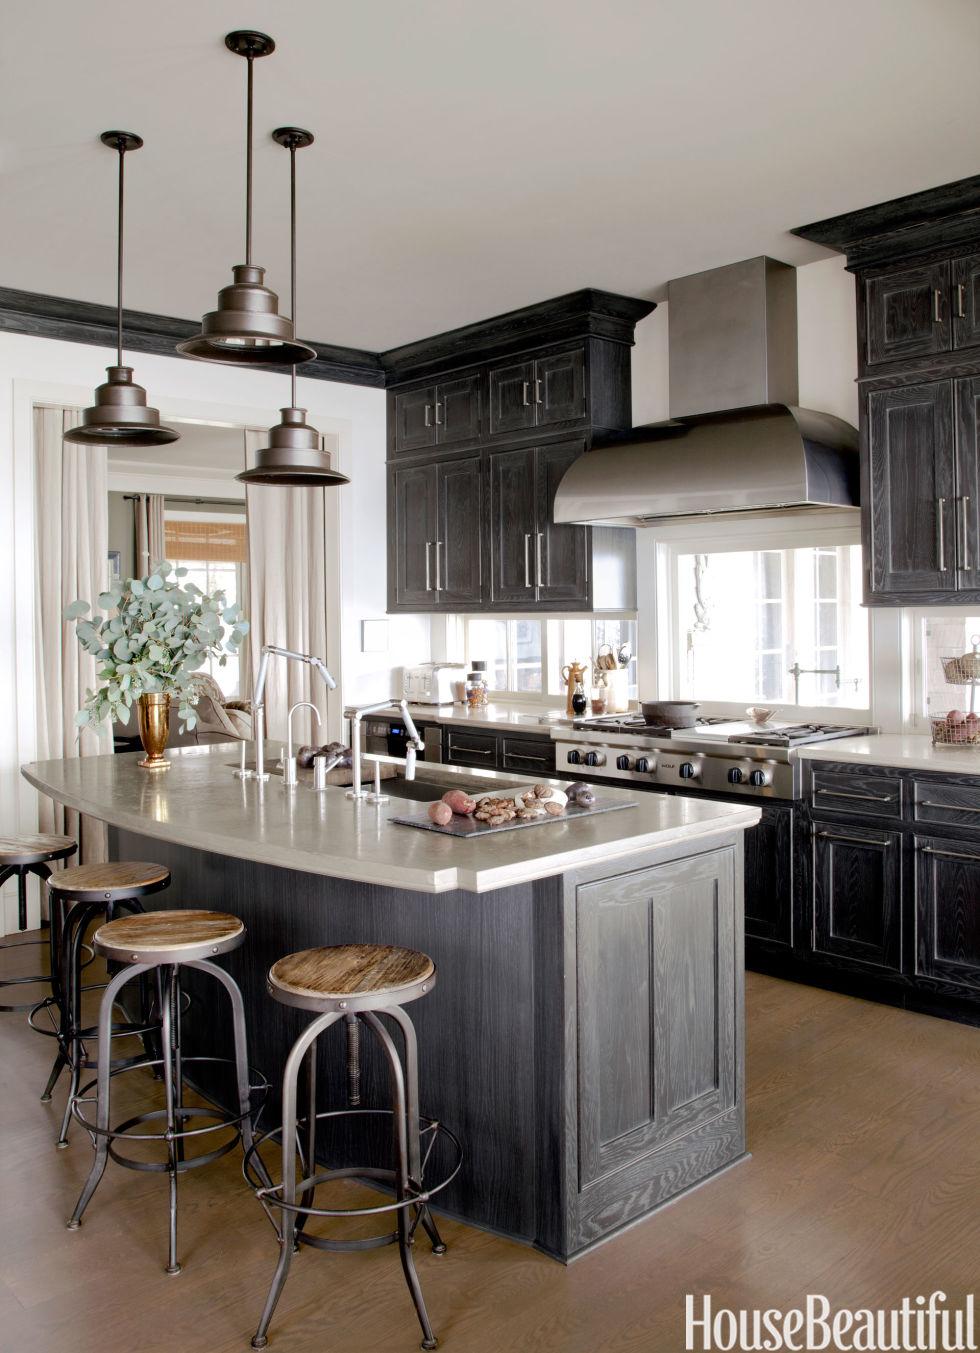 Uncategorized Kitchen Design Connecticut 100 kitchen designers ct kent works design best kitchens of 2013 designs 2013